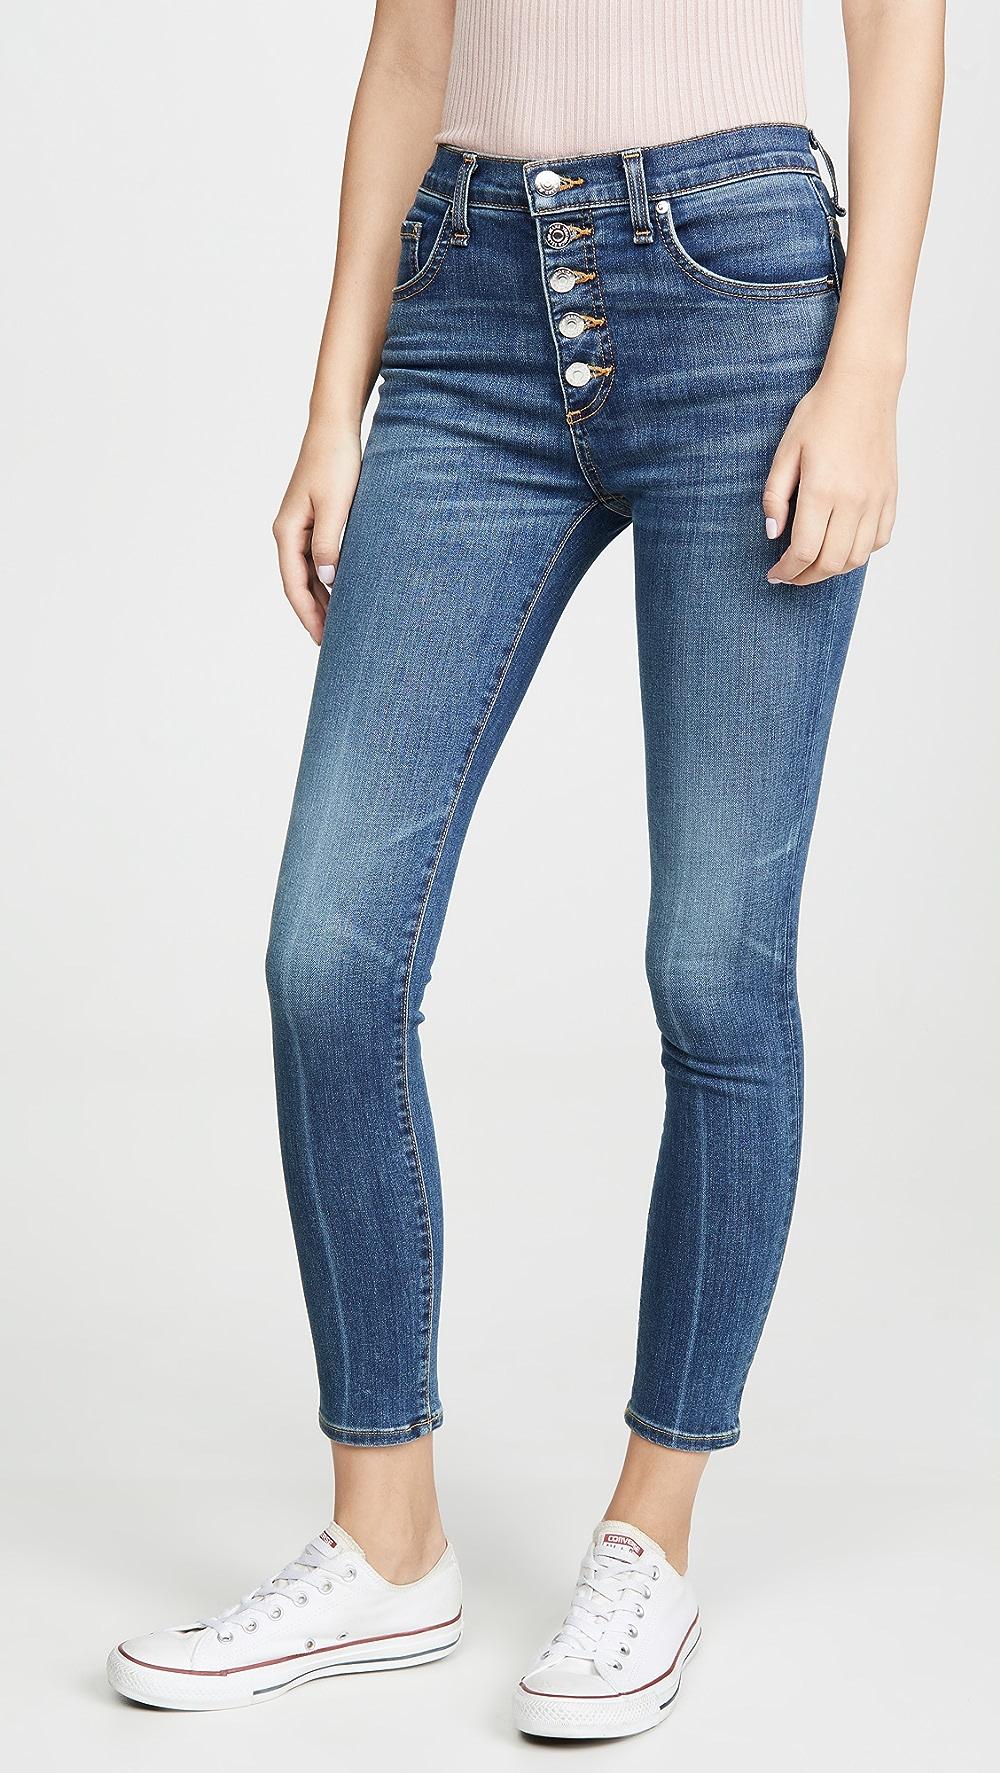 Creative Veronica Beard Jean - Debbie High Rise Skinny Long Jeans Quell Summer Thirst